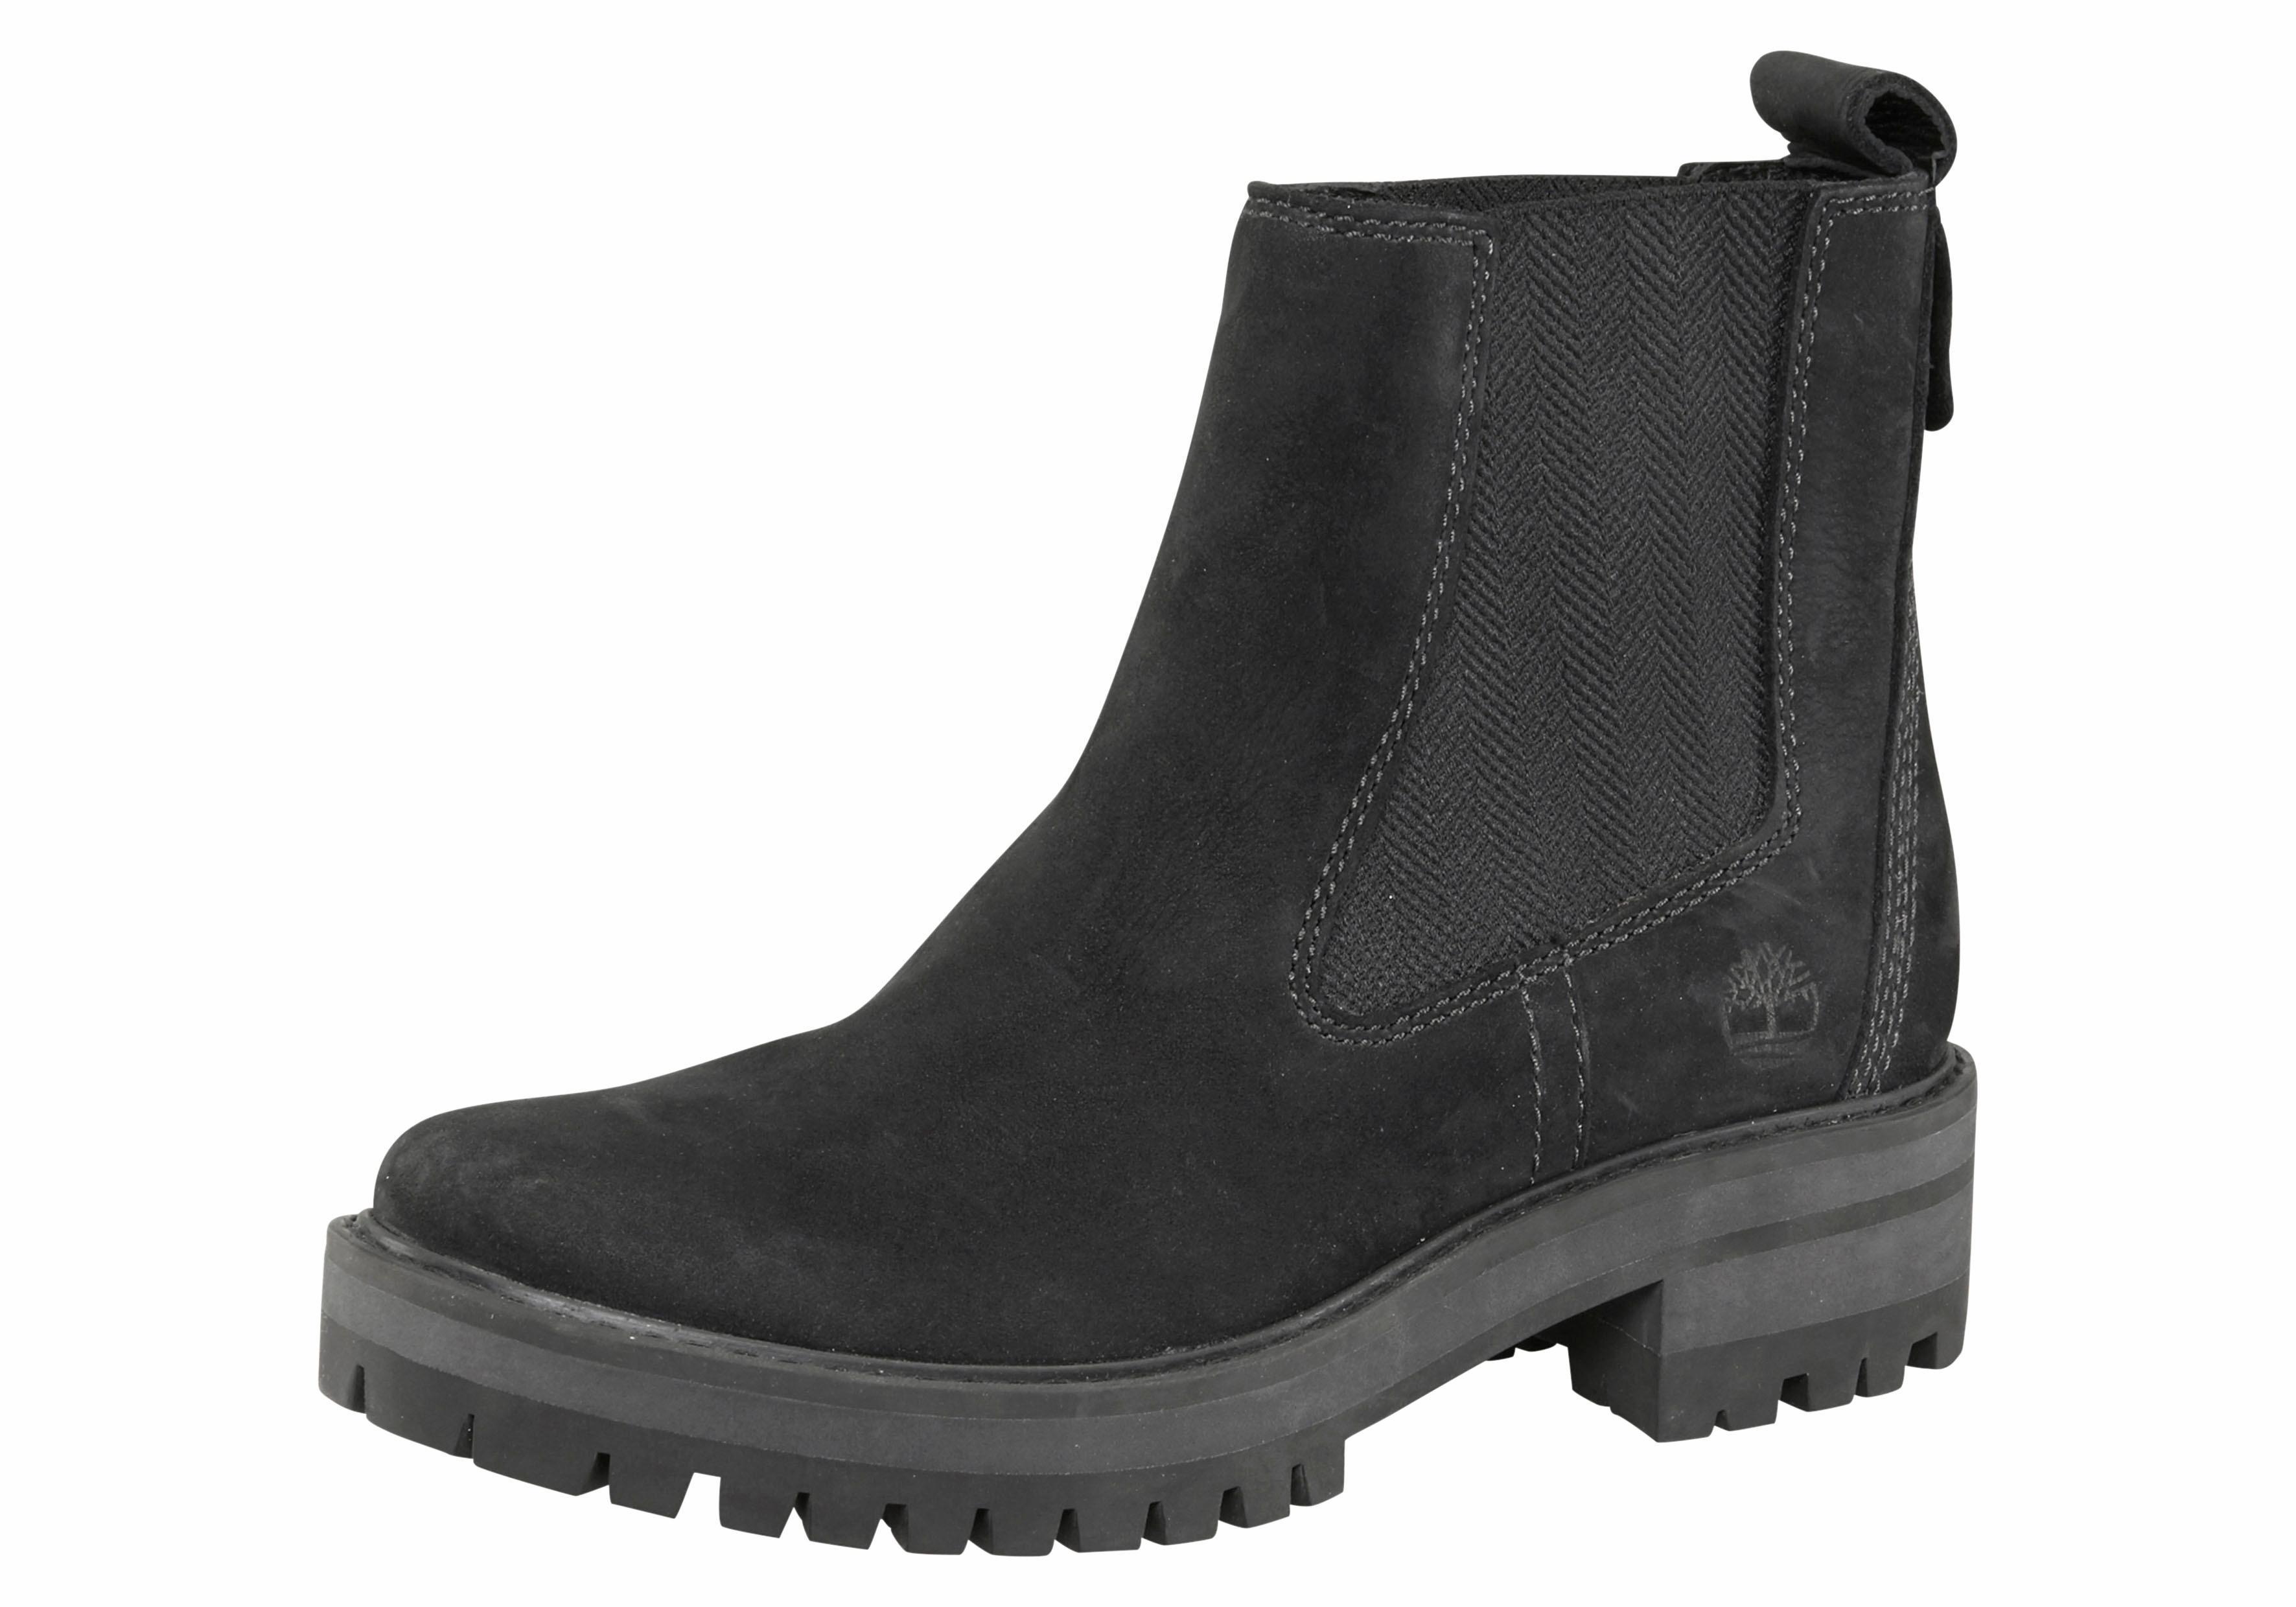 Timberland Chelseaboots Courmayeur Valley | Schuhe > Boots > Chelsea-Boots | Schwarz | Timberland